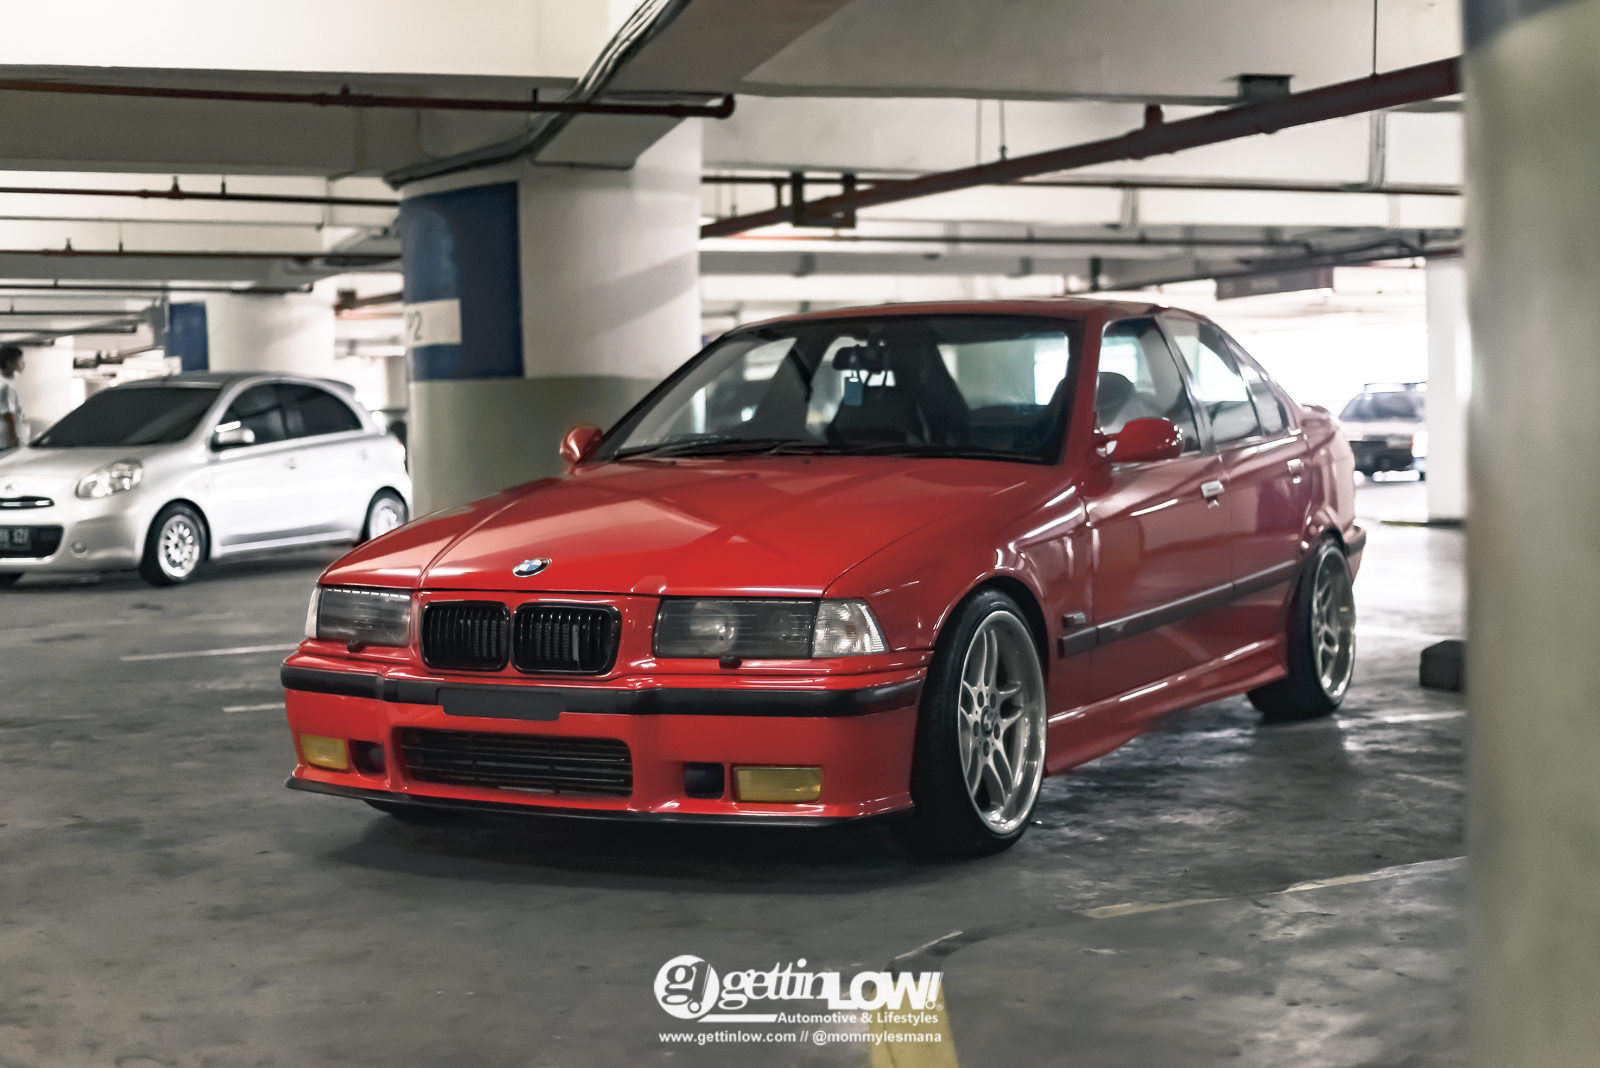 LFD17-BMW-E36-RED-3